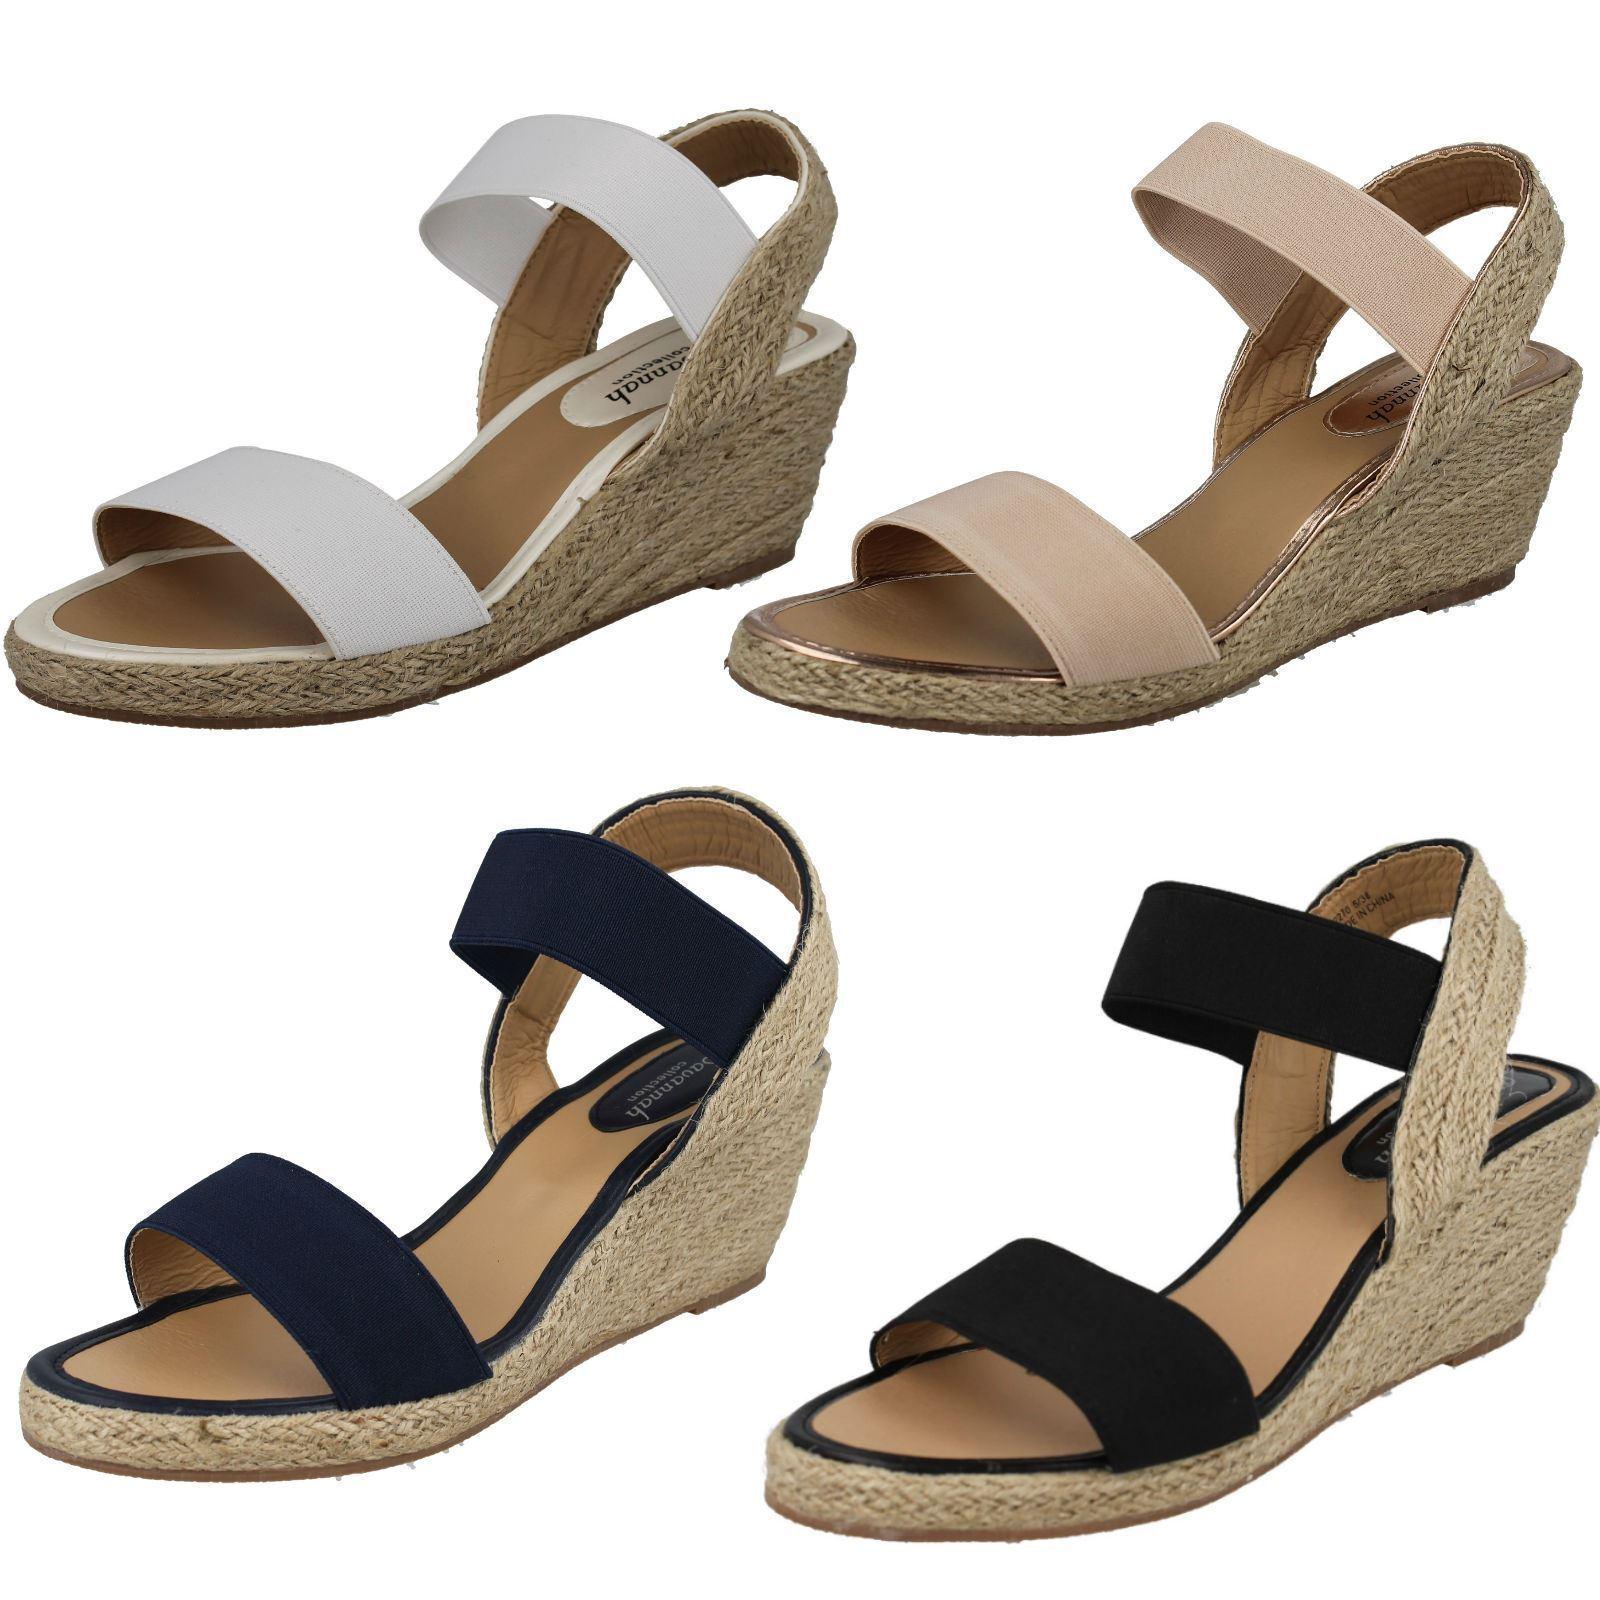 Ladies Spot UK On Elasticated Wedge Sandals UK Spot Sizes 3-8 F2R270 0e0ba8